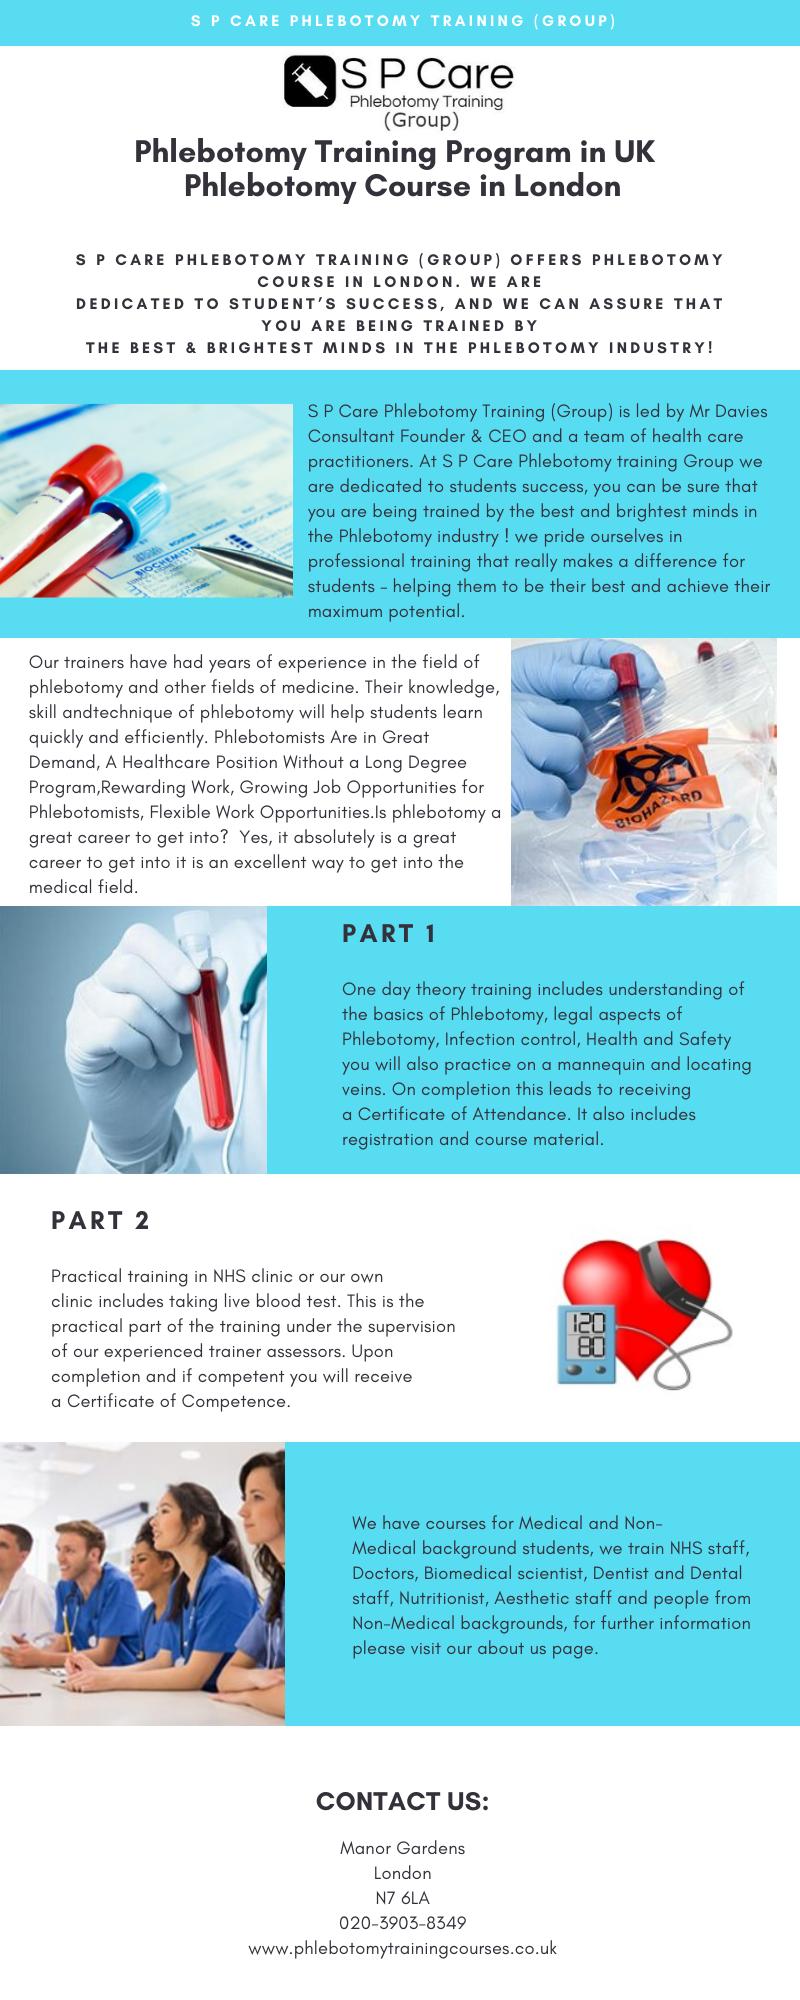 phlebotomy training program care student certificate success medical london programs